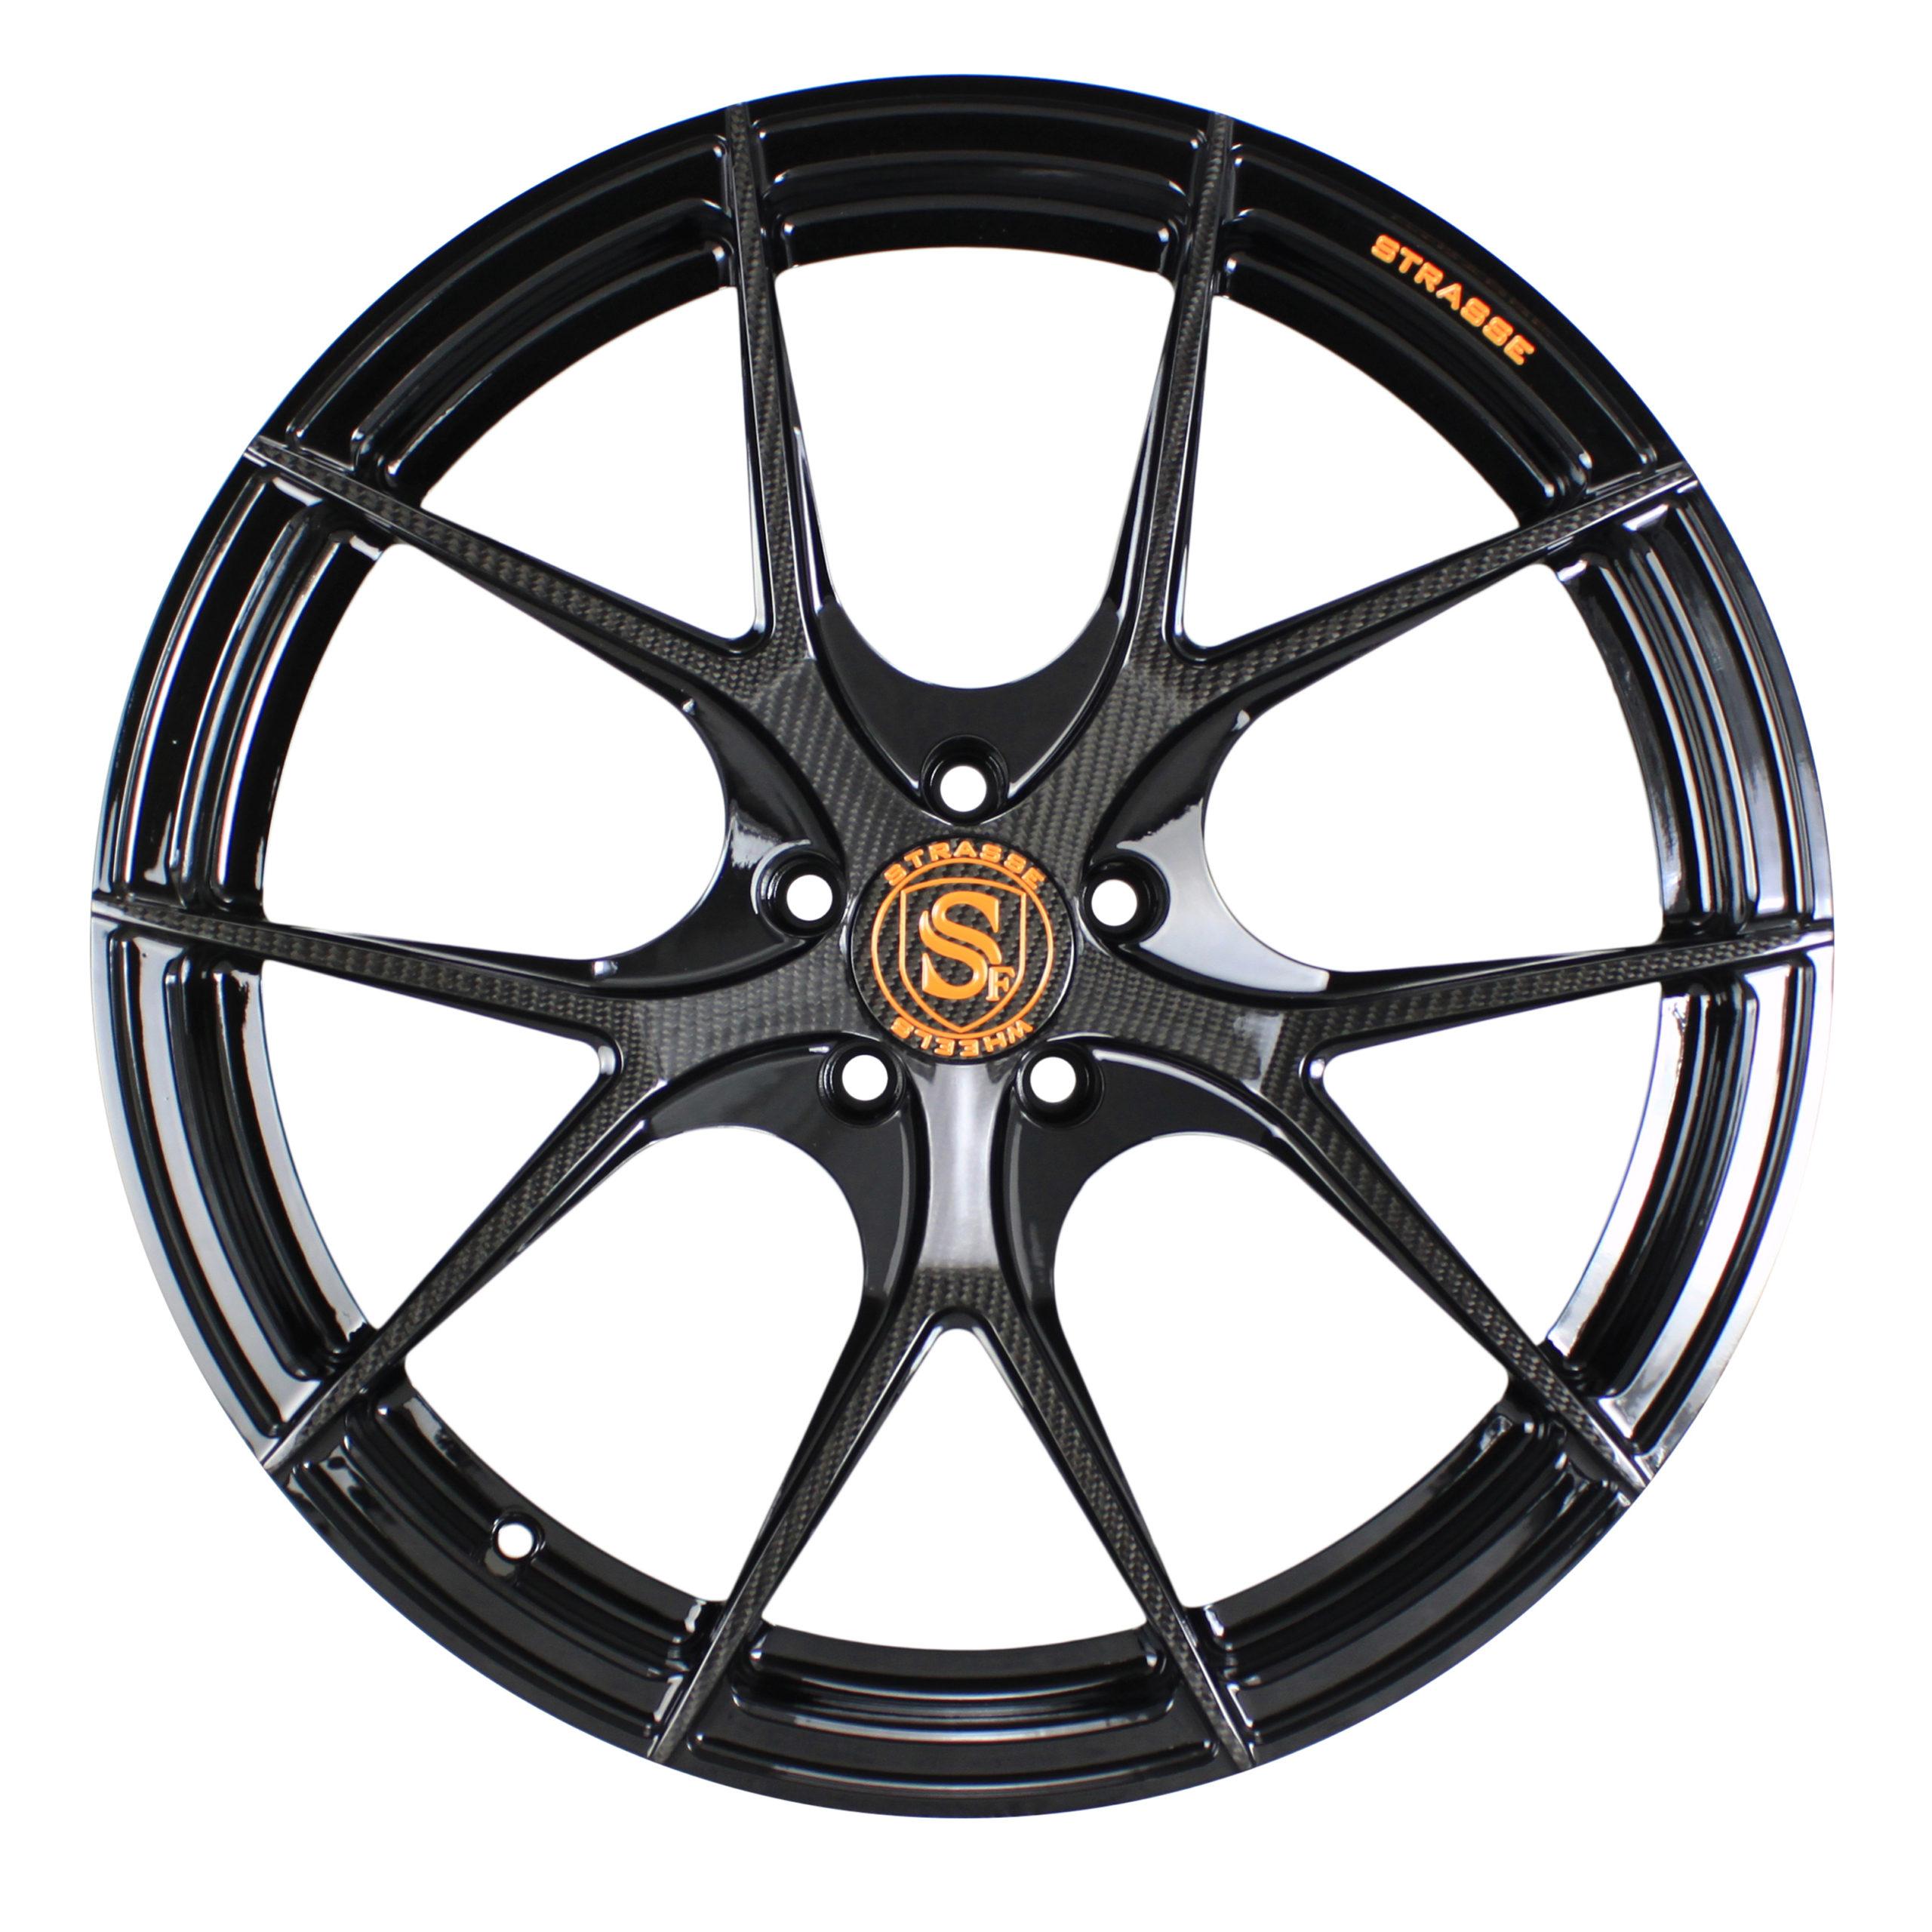 strassewheels.com